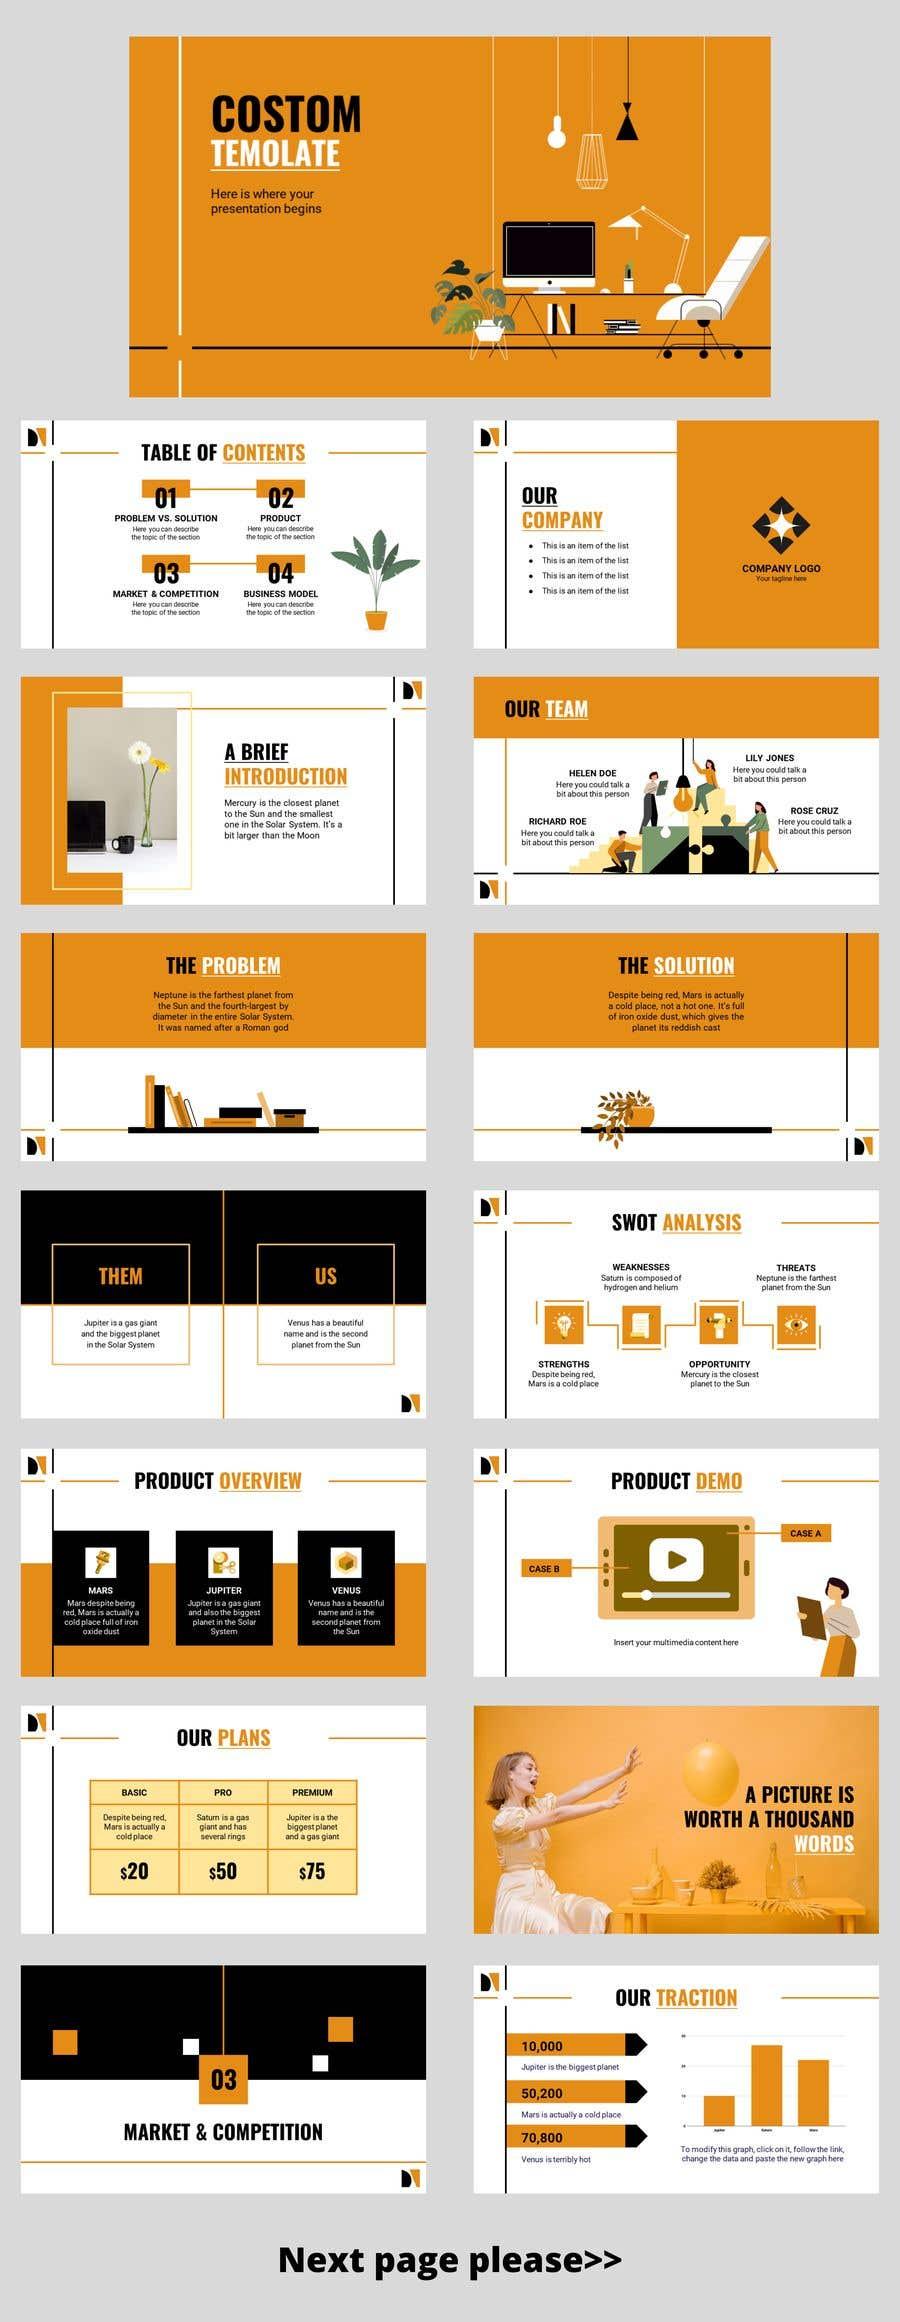 Penyertaan Peraduan #                                        17                                      untuk                                         Design a Custom PowerPoint Template